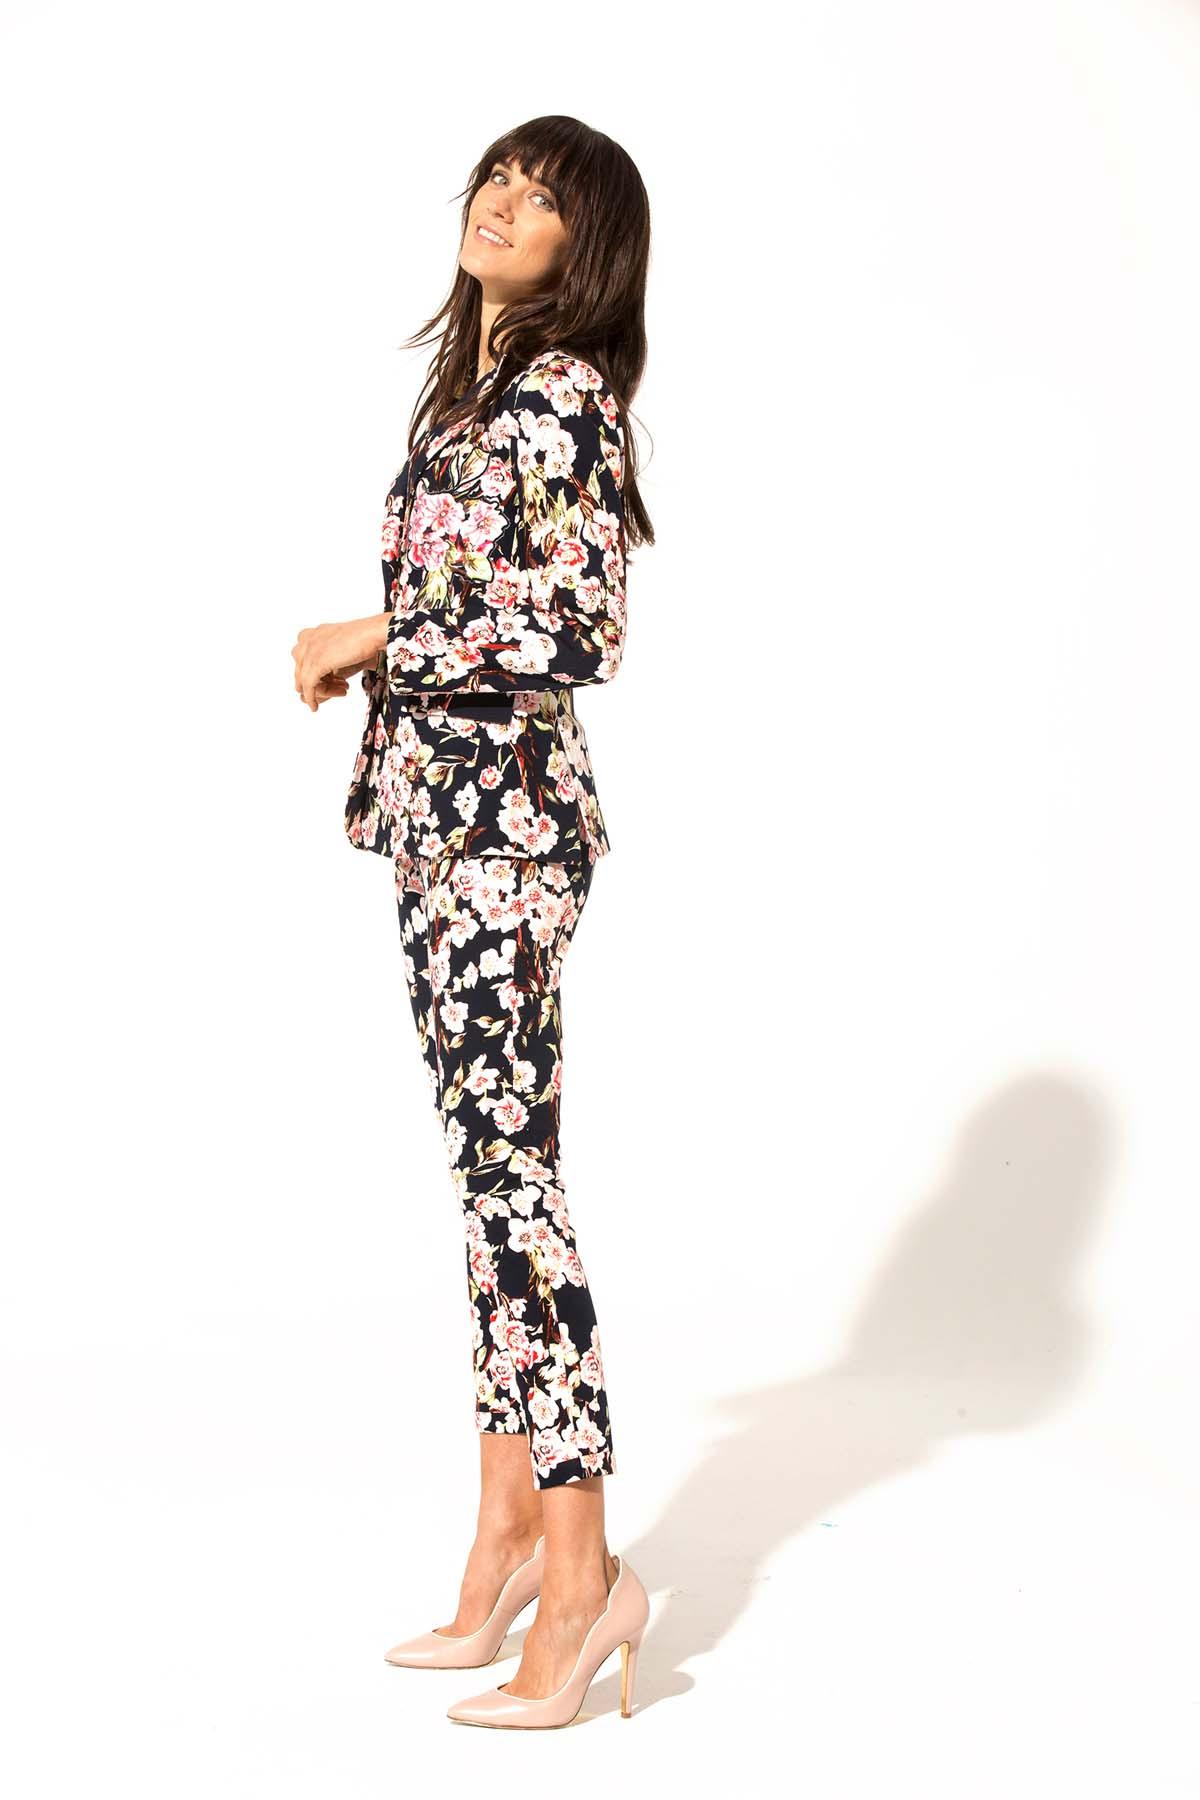 Teria Yabar - Chaqueta de flores